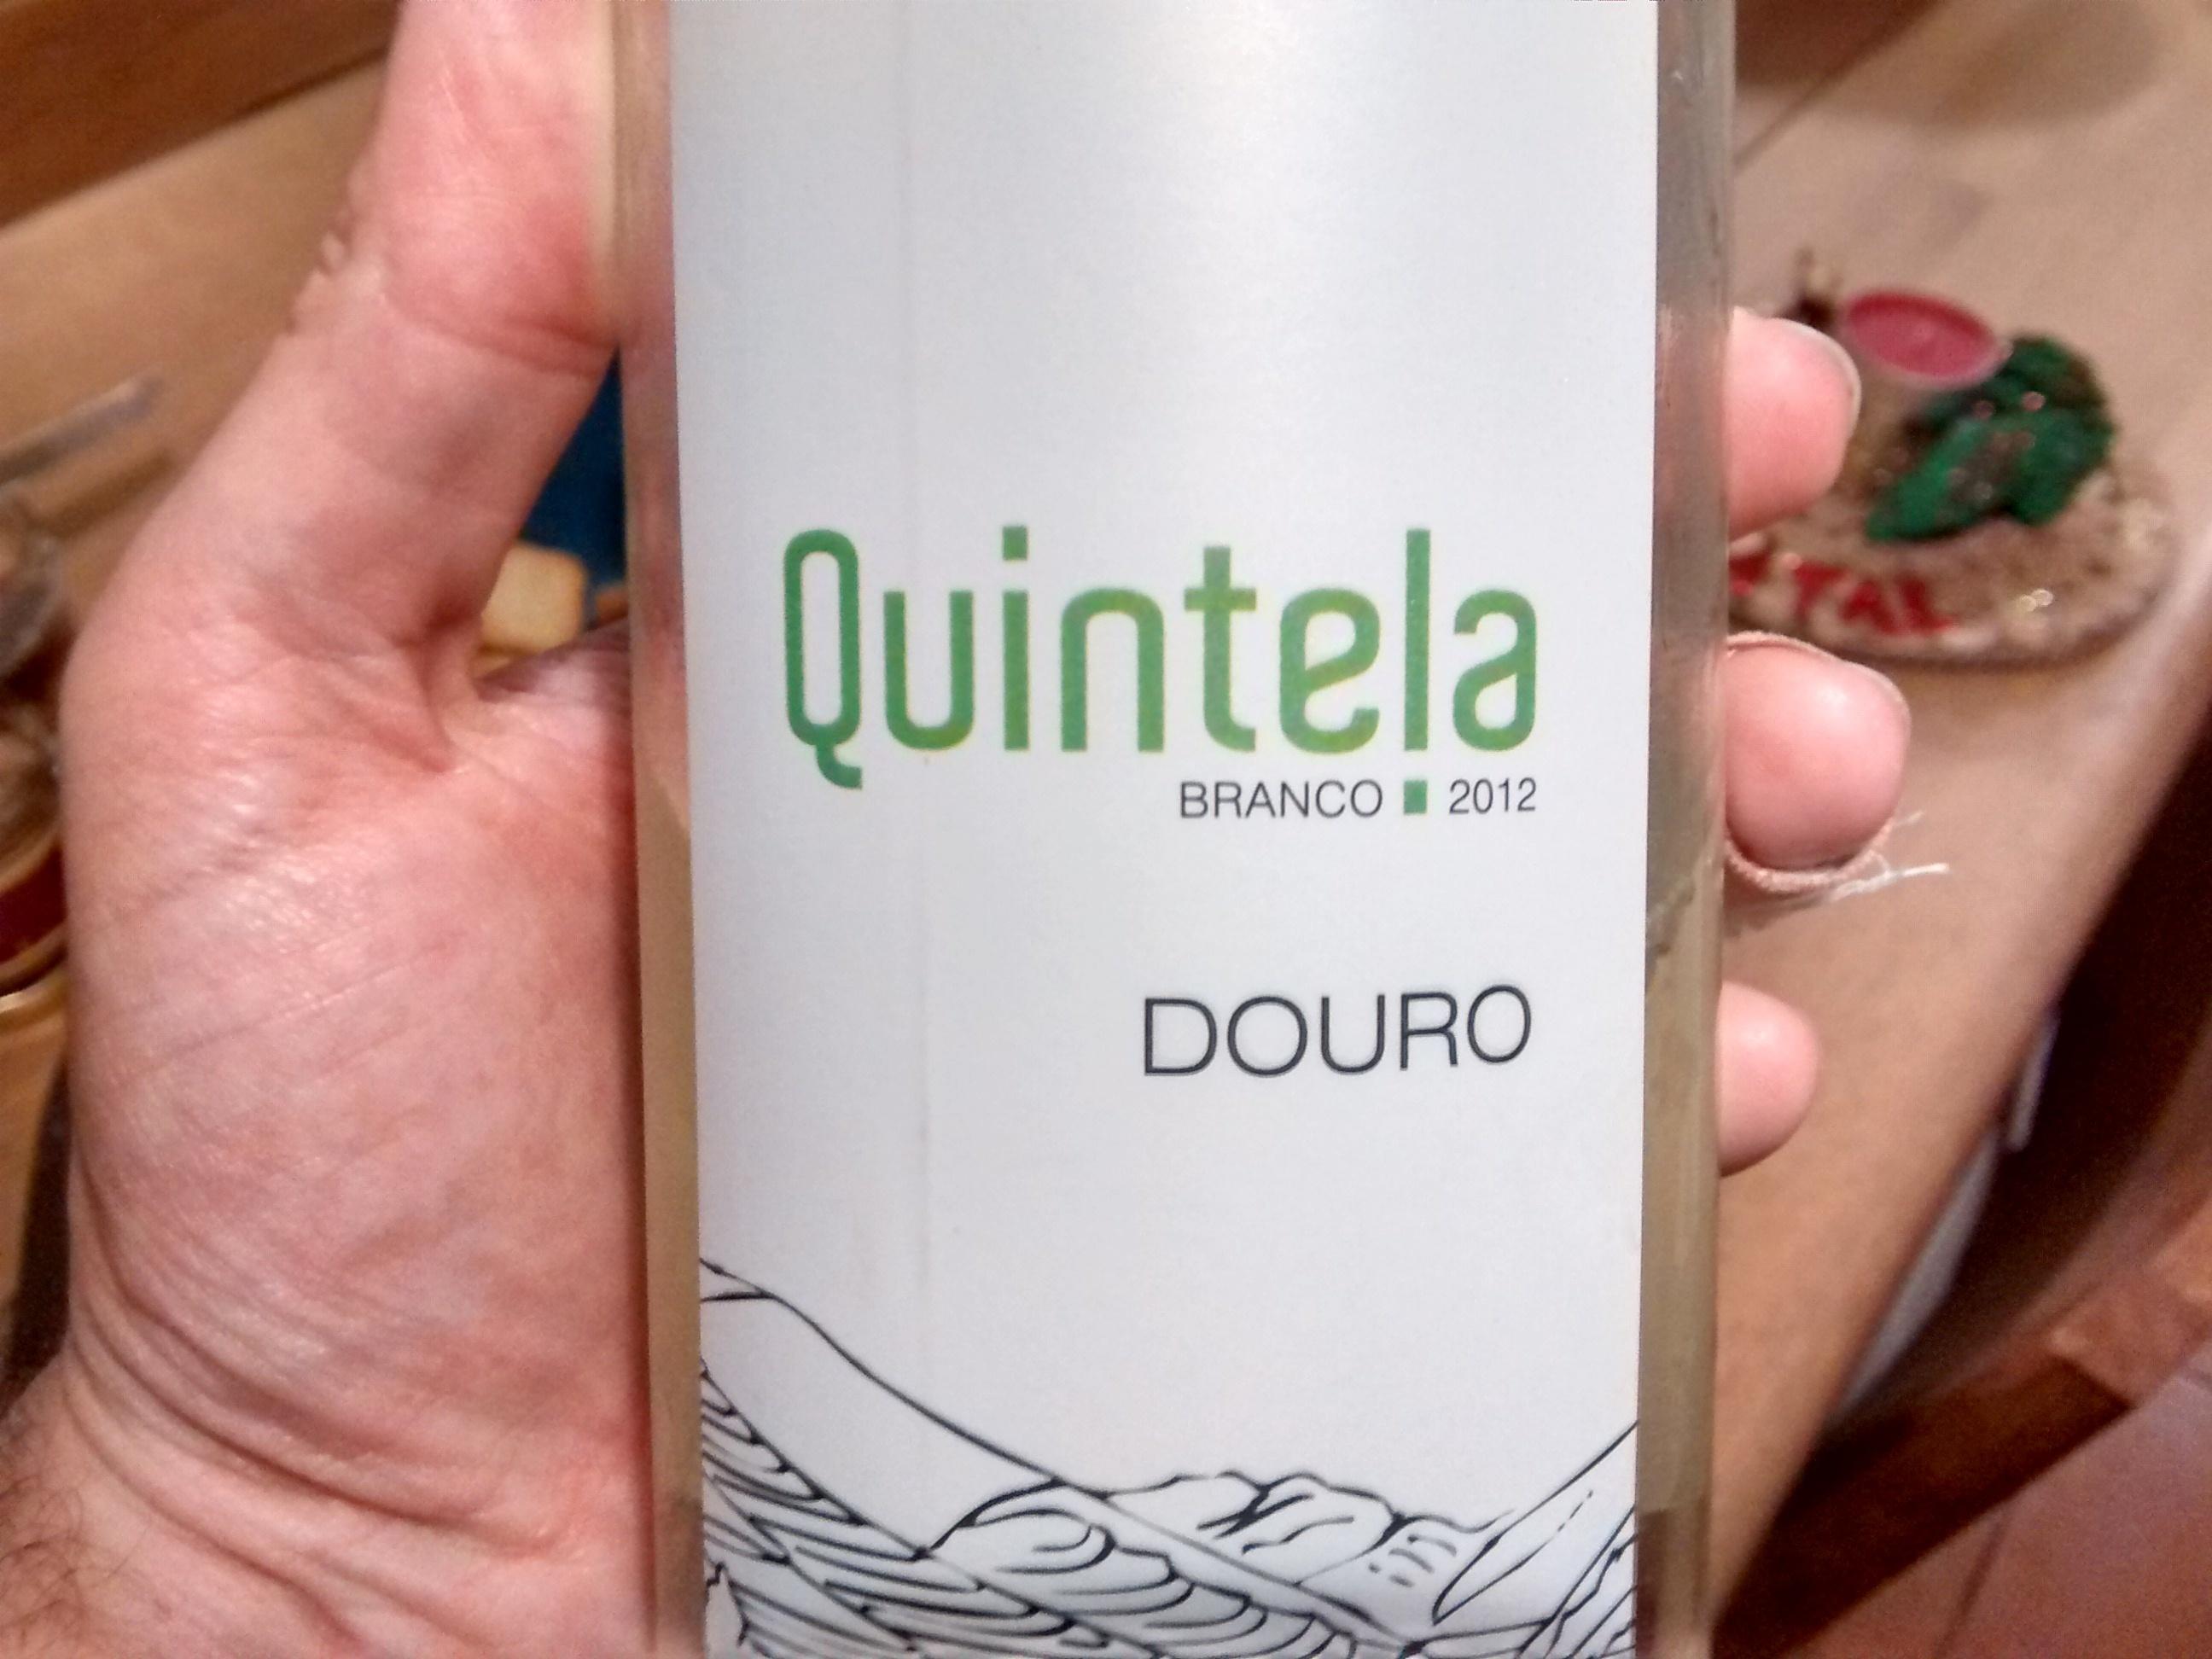 Quintela-Douro